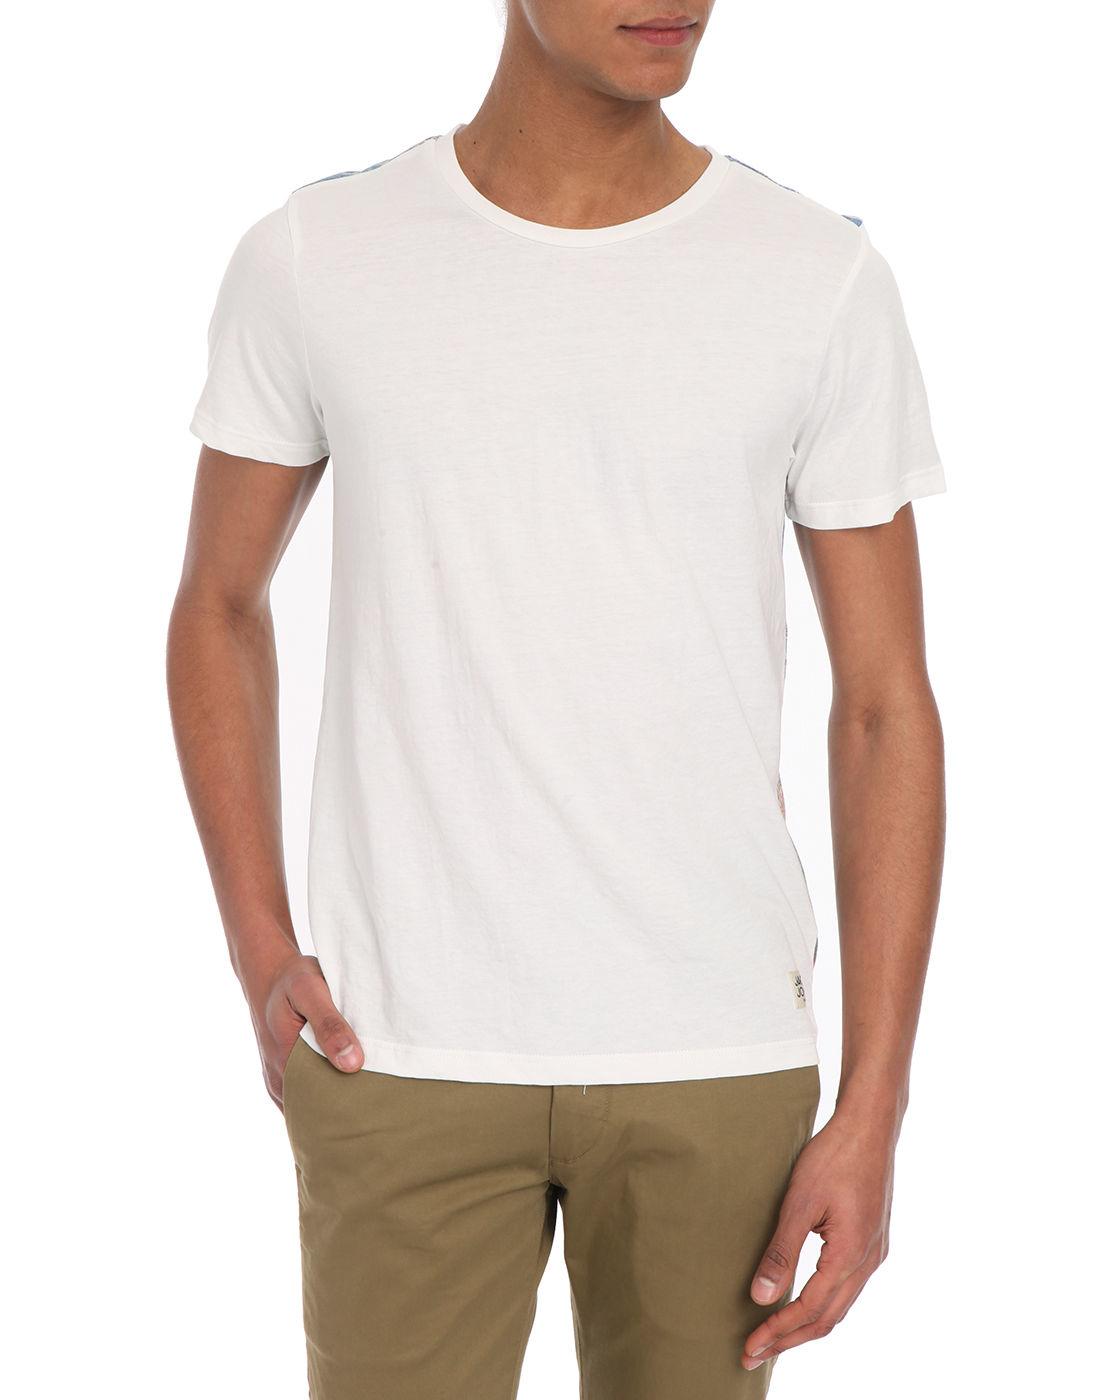 jack jones sun flowers print t shirt in white for men lyst. Black Bedroom Furniture Sets. Home Design Ideas